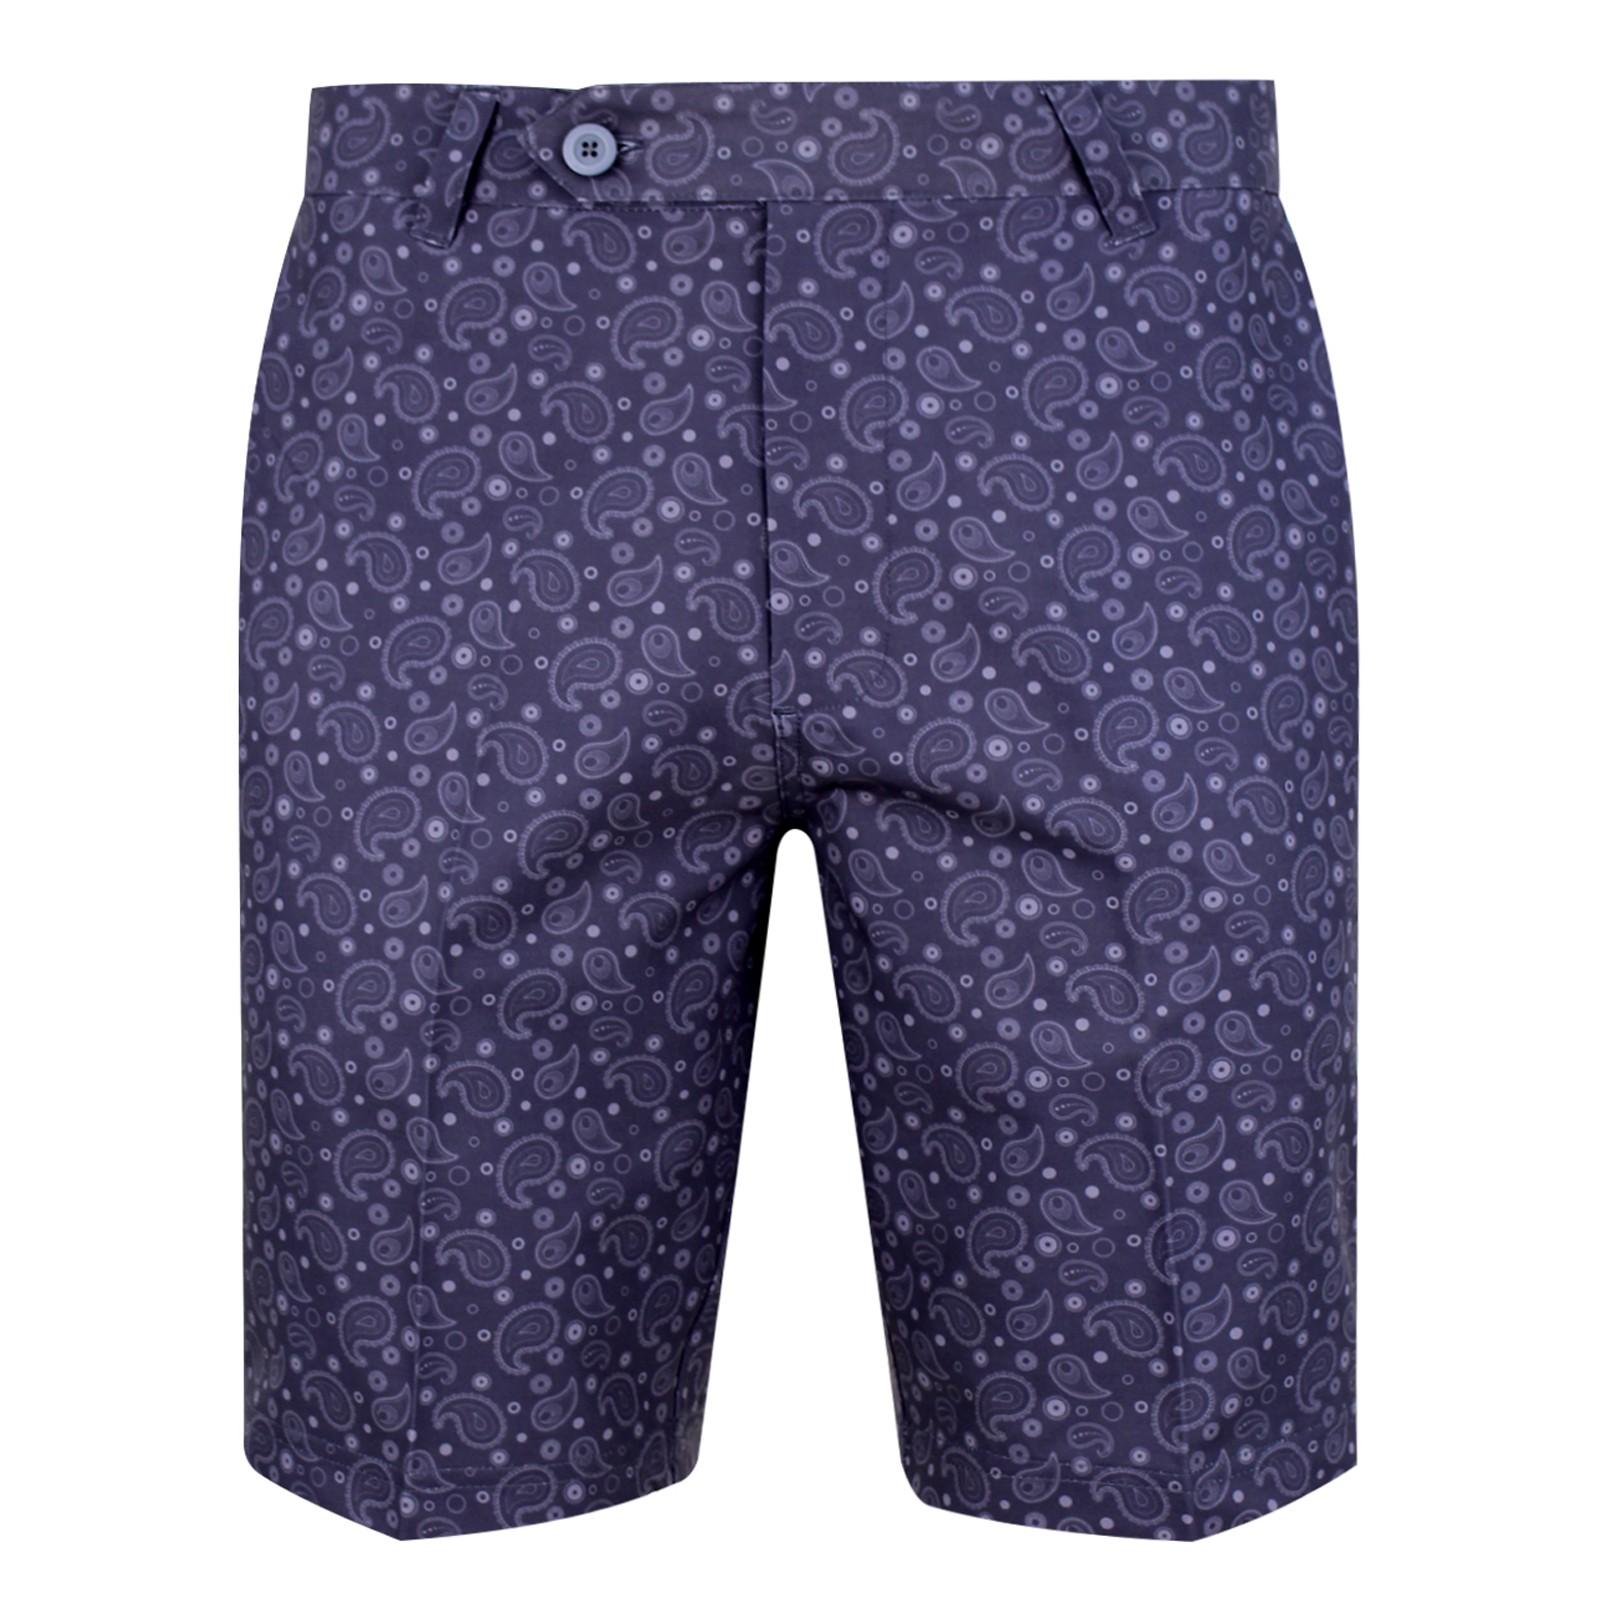 Bunker Mentality Kade Paisley Polyester Shorts